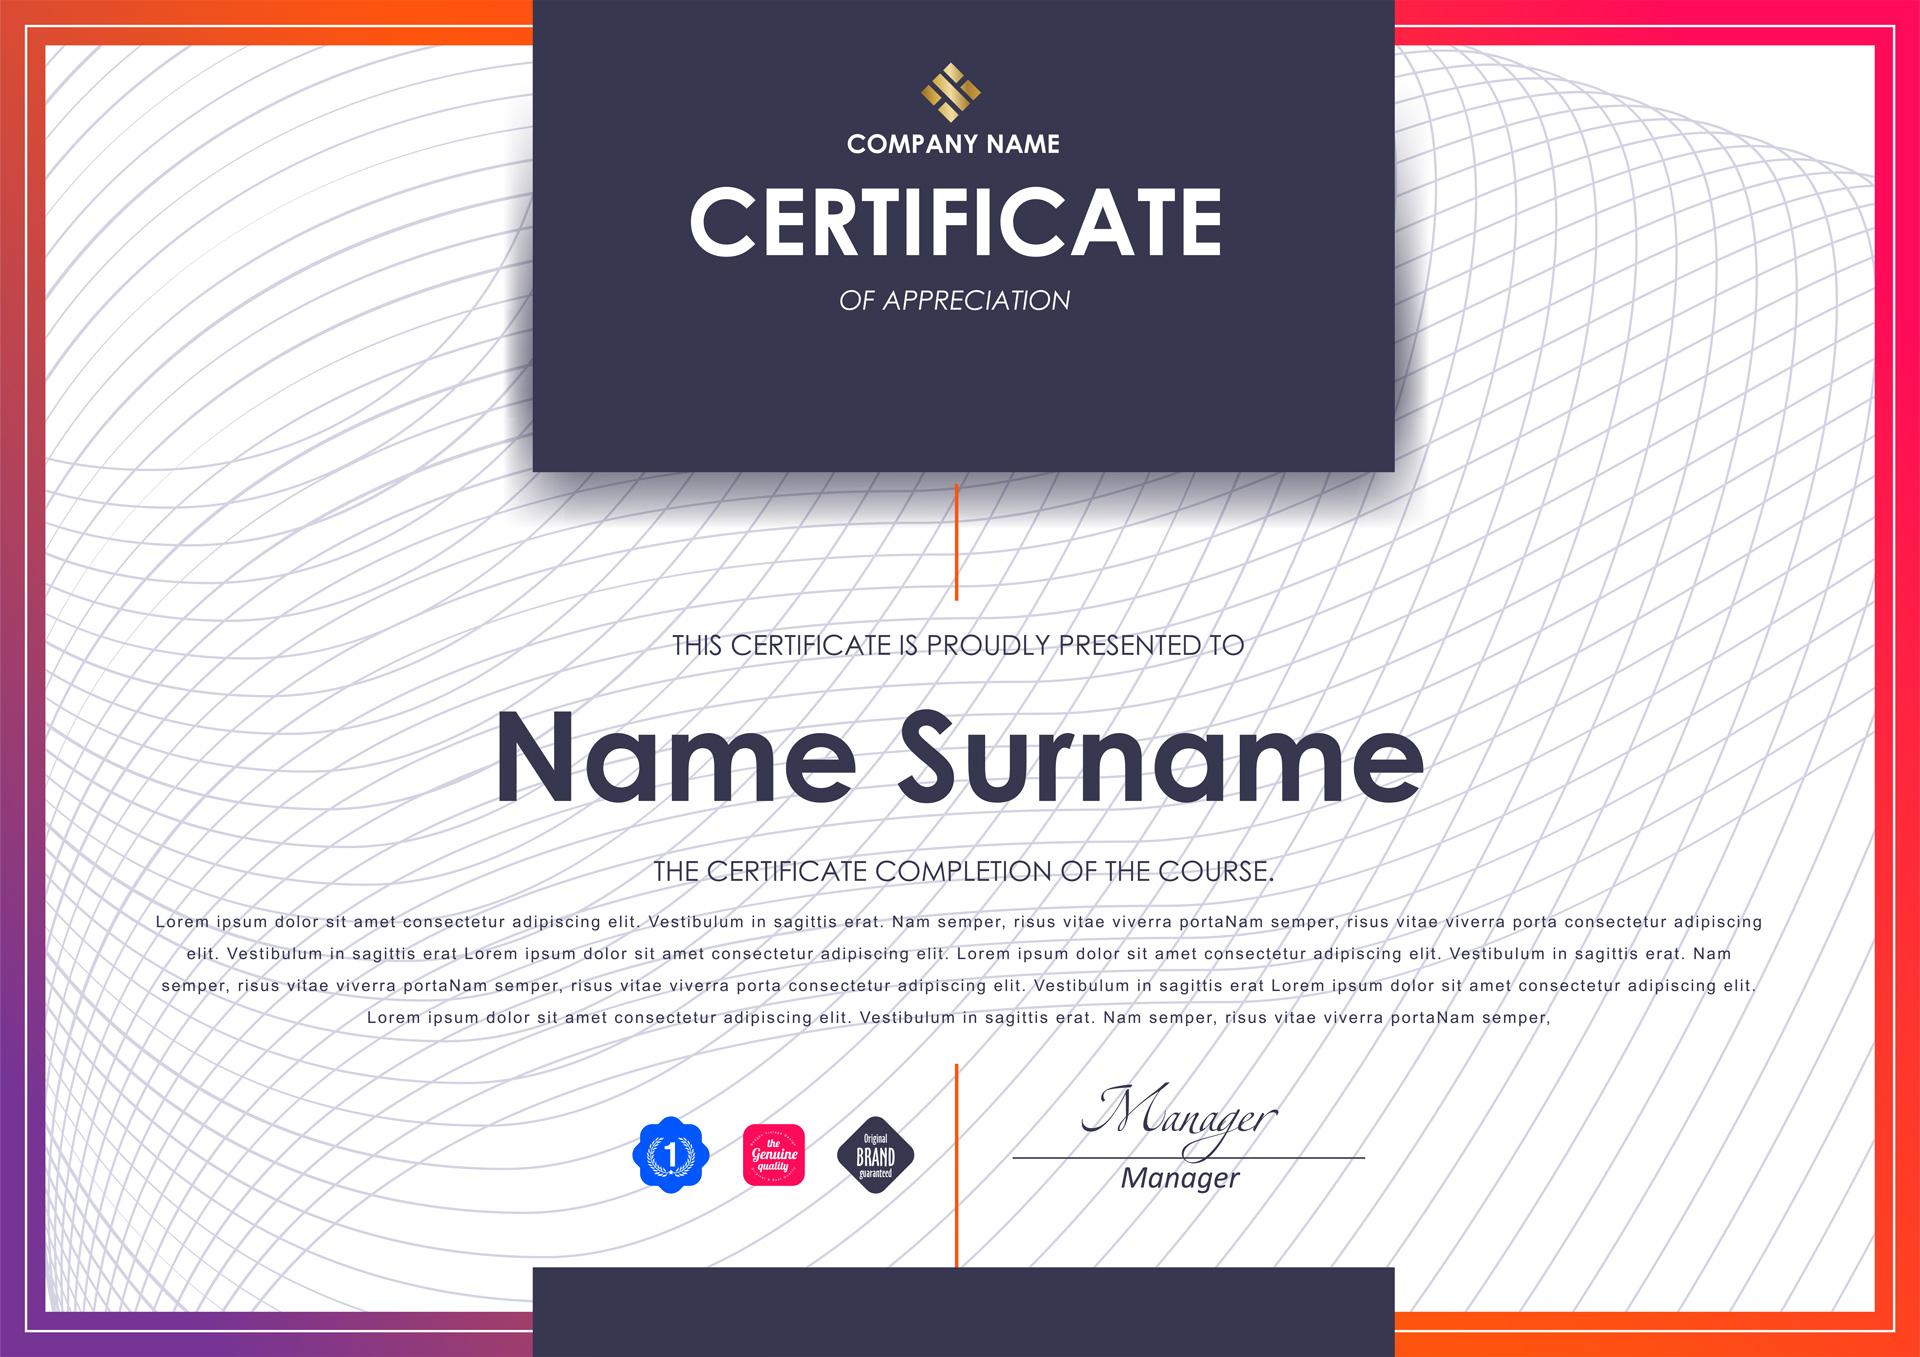 Generate Course Certificates In Articulate Storyline 360 Using jsPDF